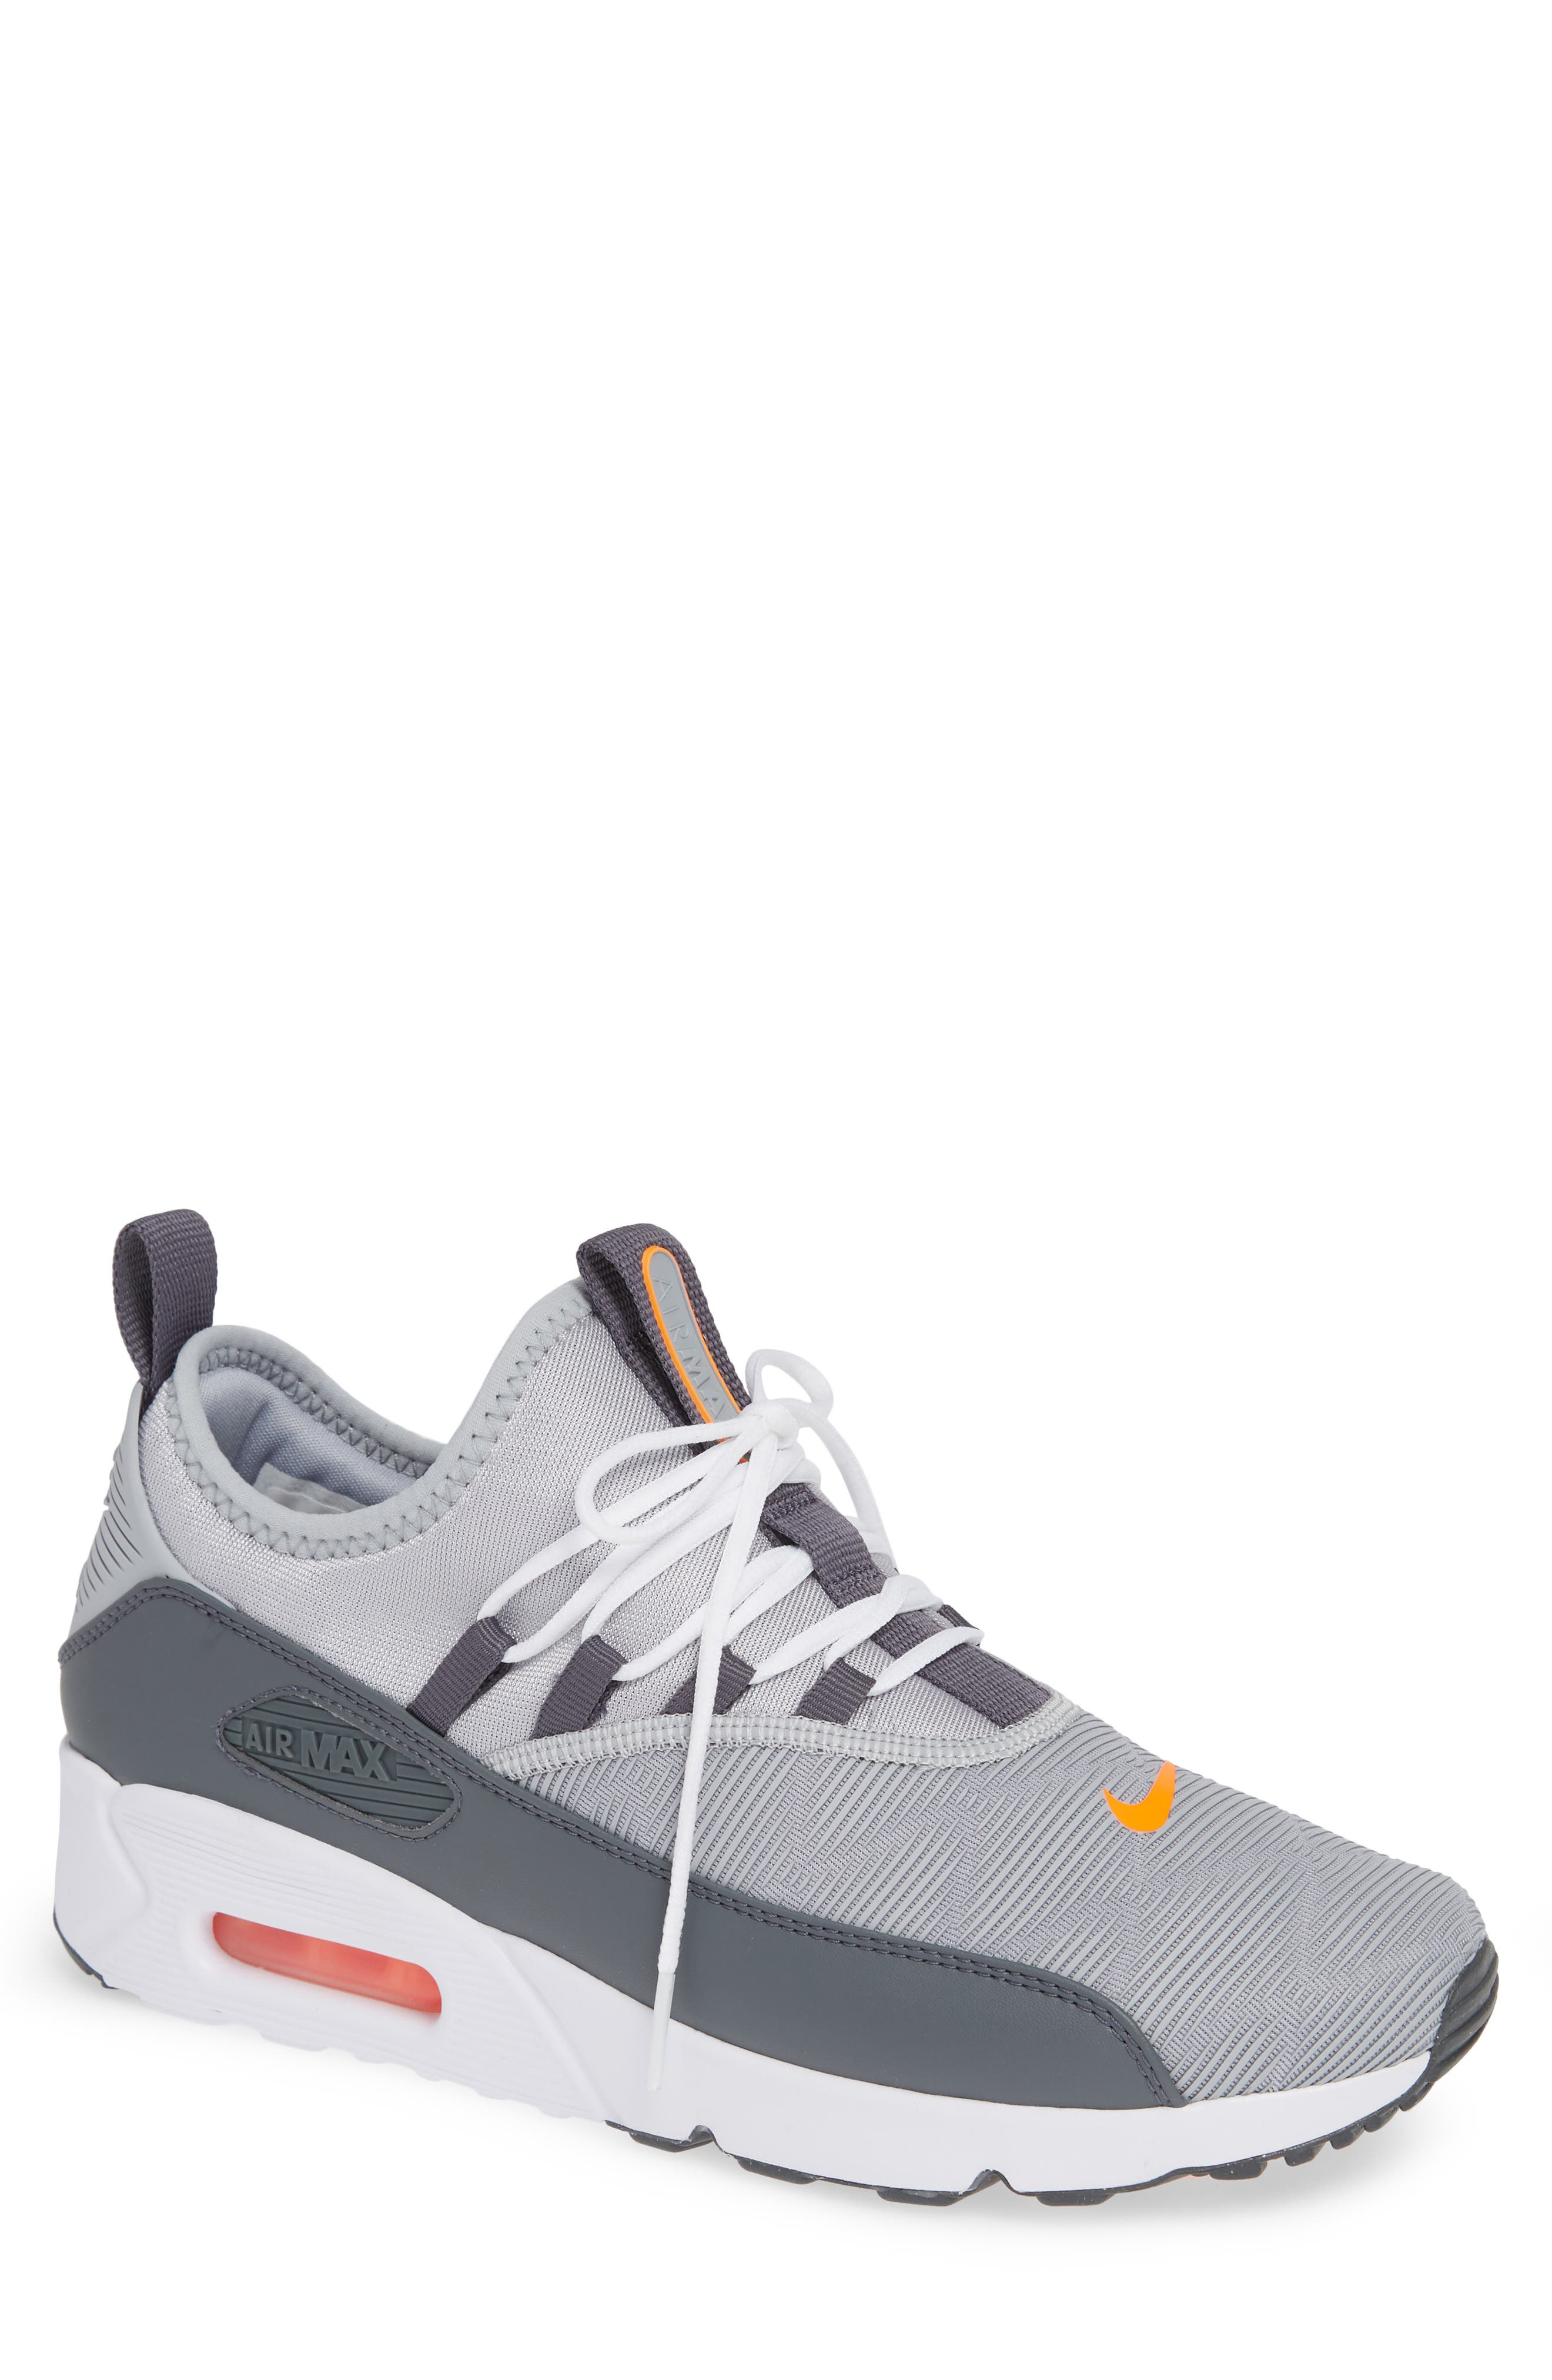 Air Max 90 EZ Sneaker,                         Main,                         color, WOLF GREY/ TOTAL ORANGE/ WHITE